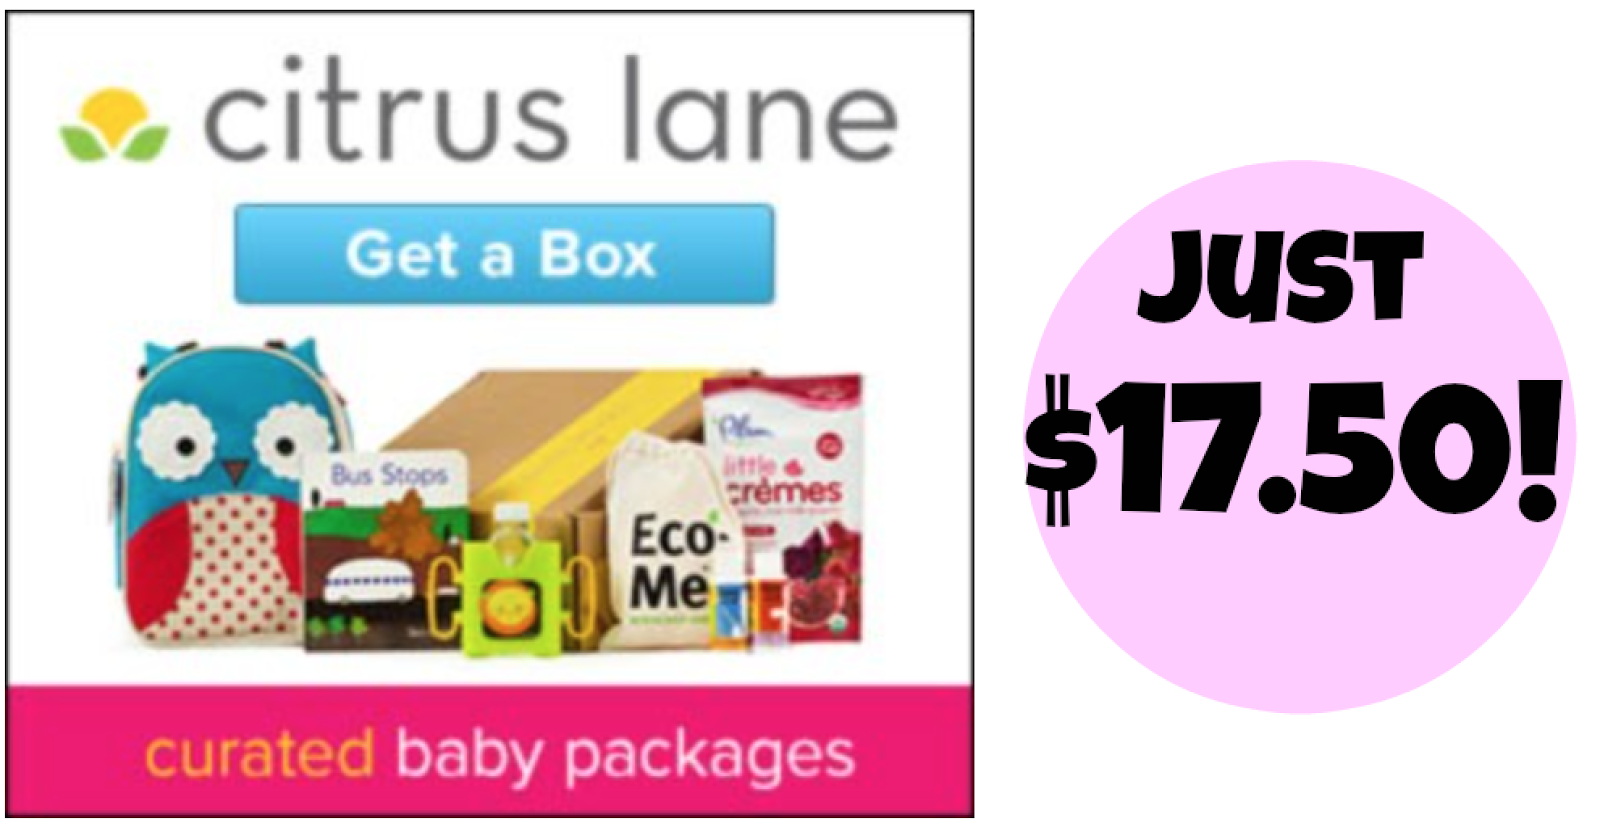 http://www.thebinderladies.com/2015/03/citruslane-baby-care-item-box-lots-of.html#.VPchZELduyM